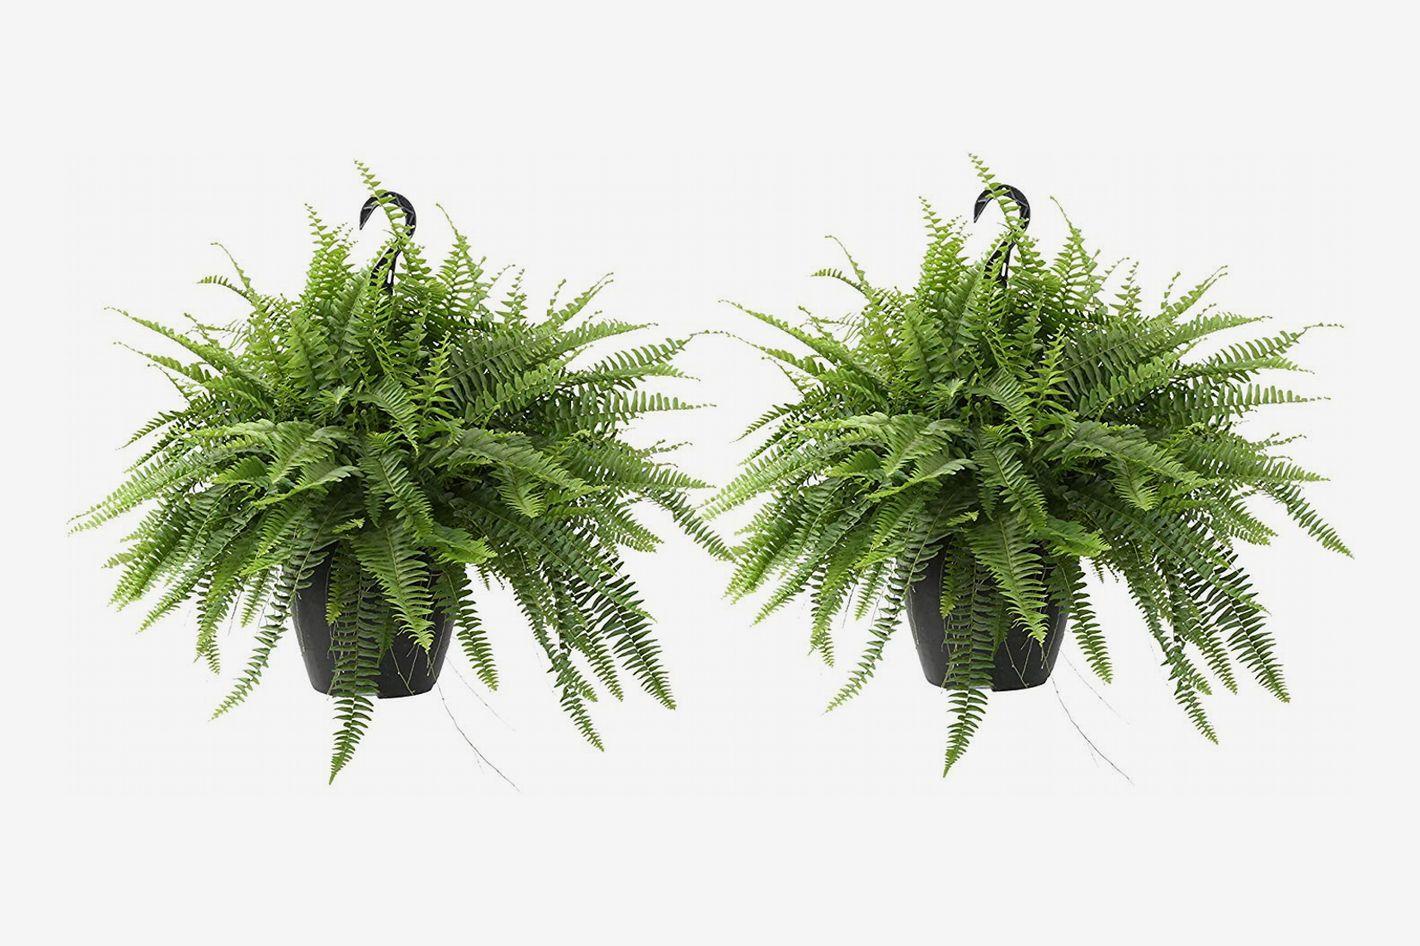 Costa Farms Boston Fern in Hanging Basket (Set of 2 Ferns)